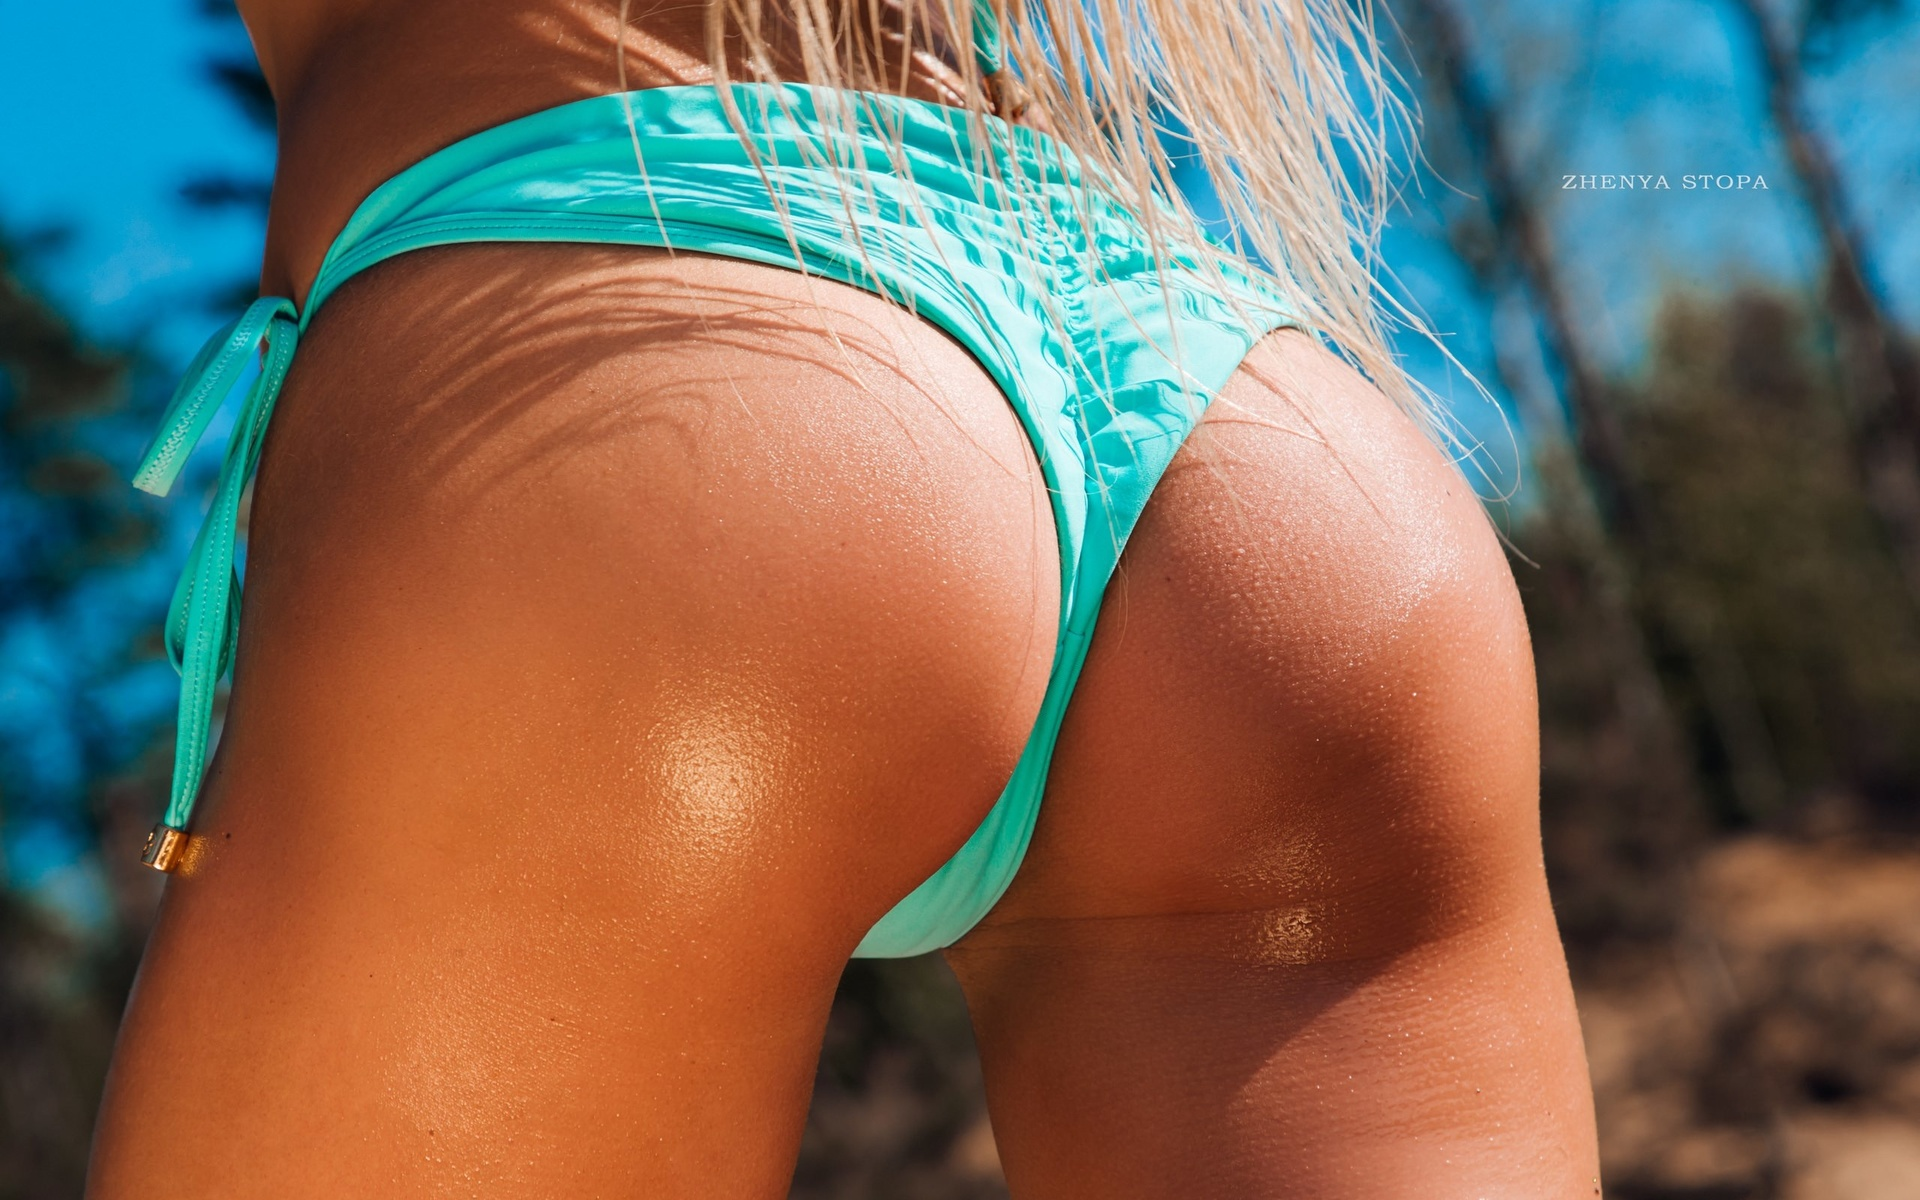 women, zhenya stopa, ass, blonde, long hair, bikini, trees, women outdoors, brunette, body oil, oiled body